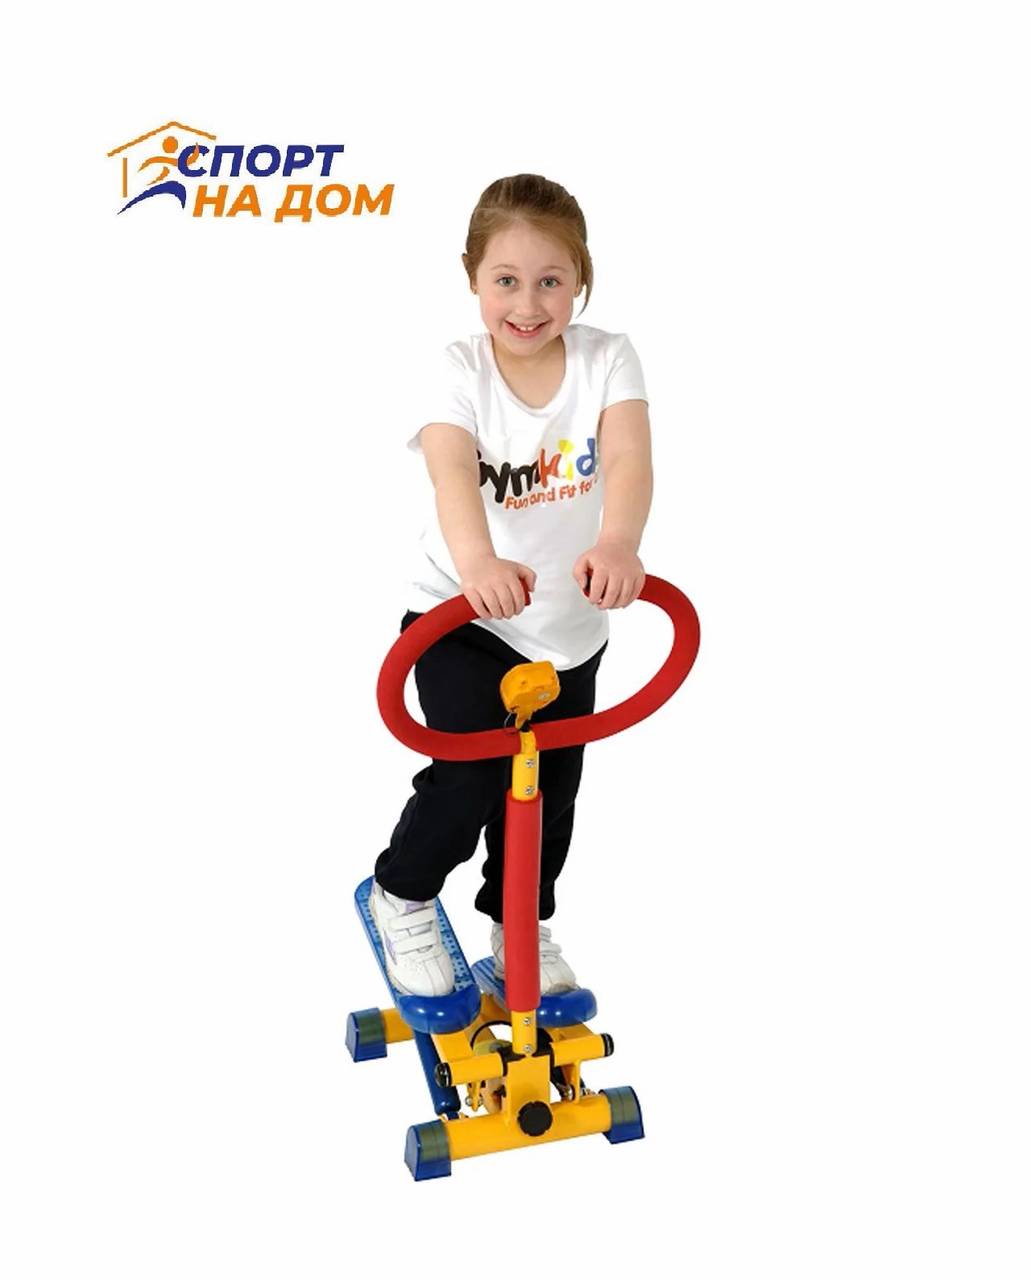 Детский тренажер степпер (3-8 лет)